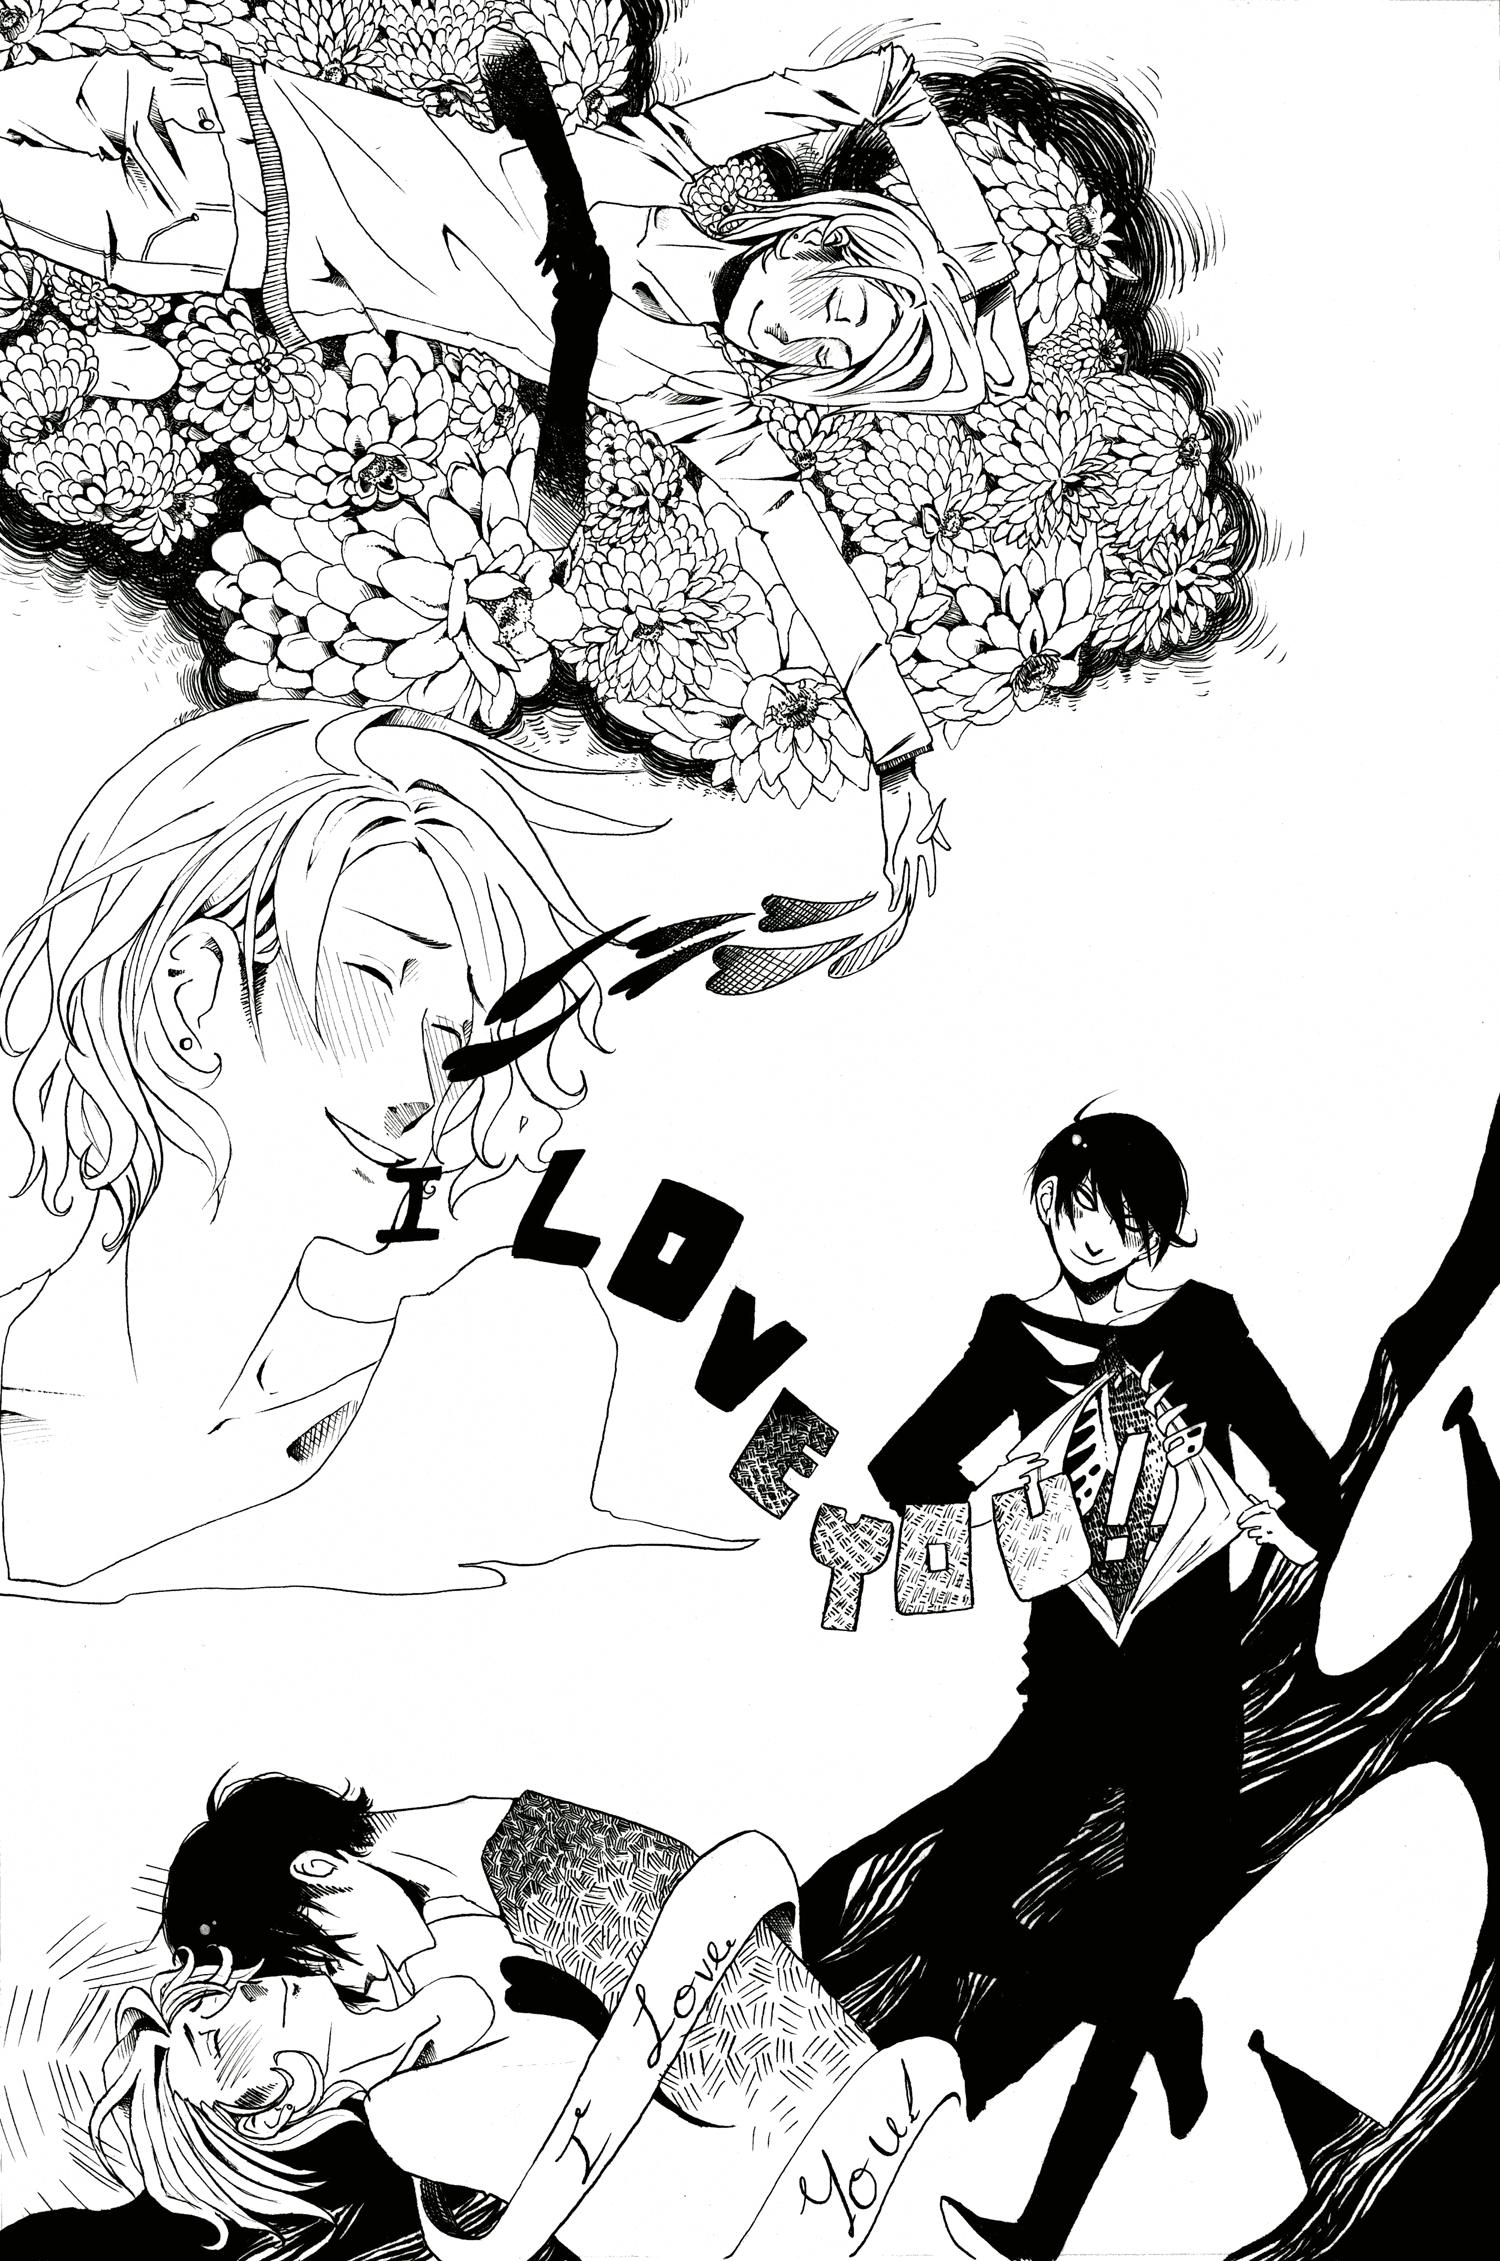 Shadow pg 1